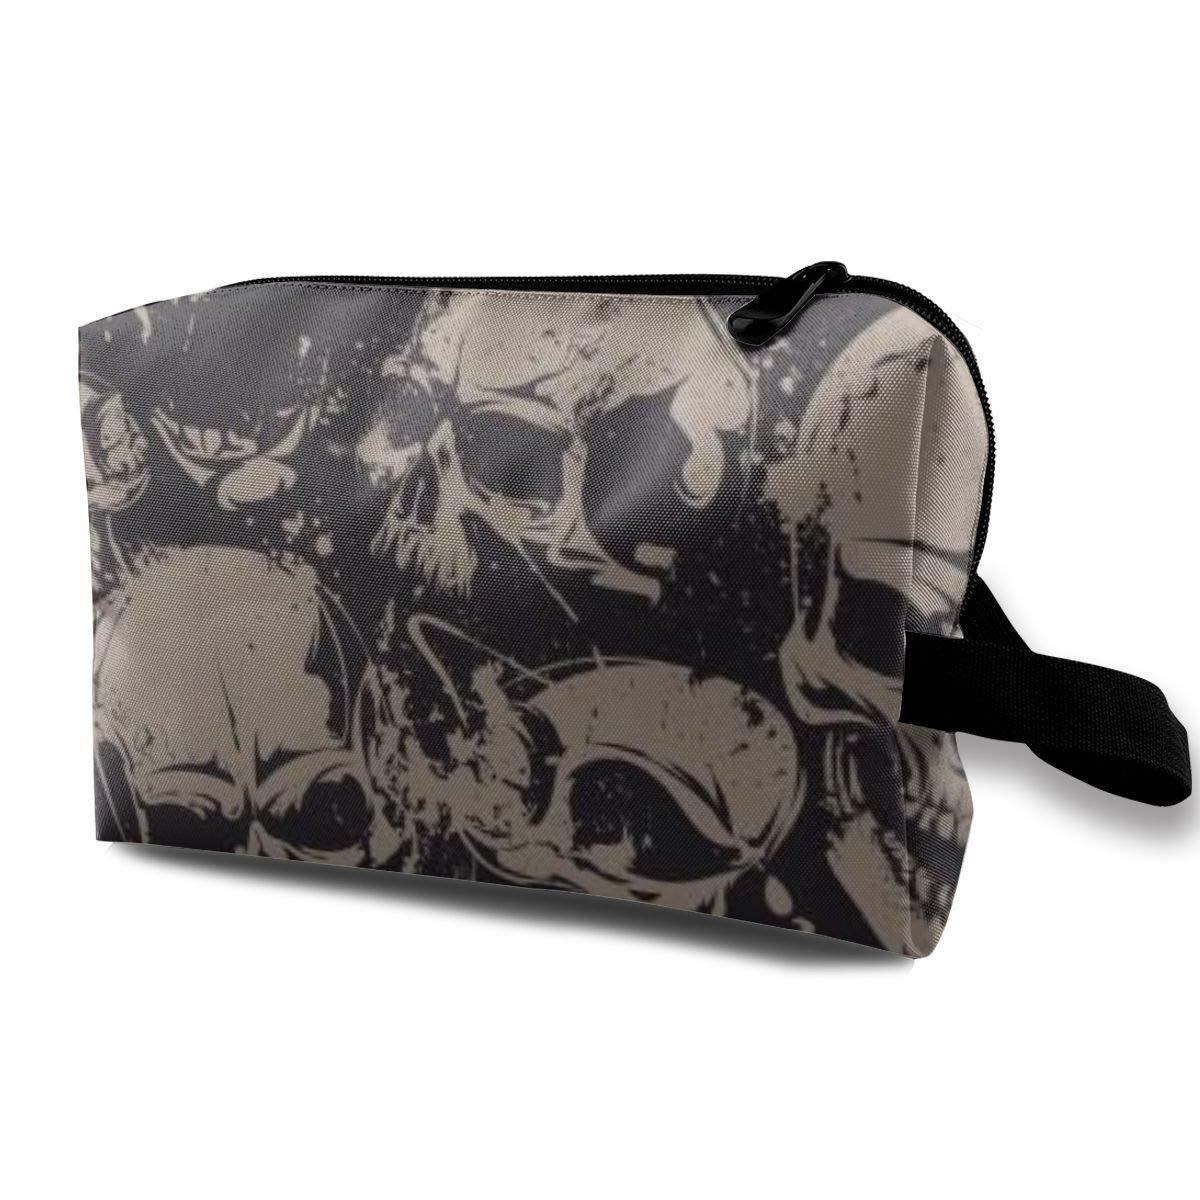 Makeup Bag Cosmetic Pouch Grunge Pattern With Skulls Multi-Functional Bag Travel Kit Storage Bag